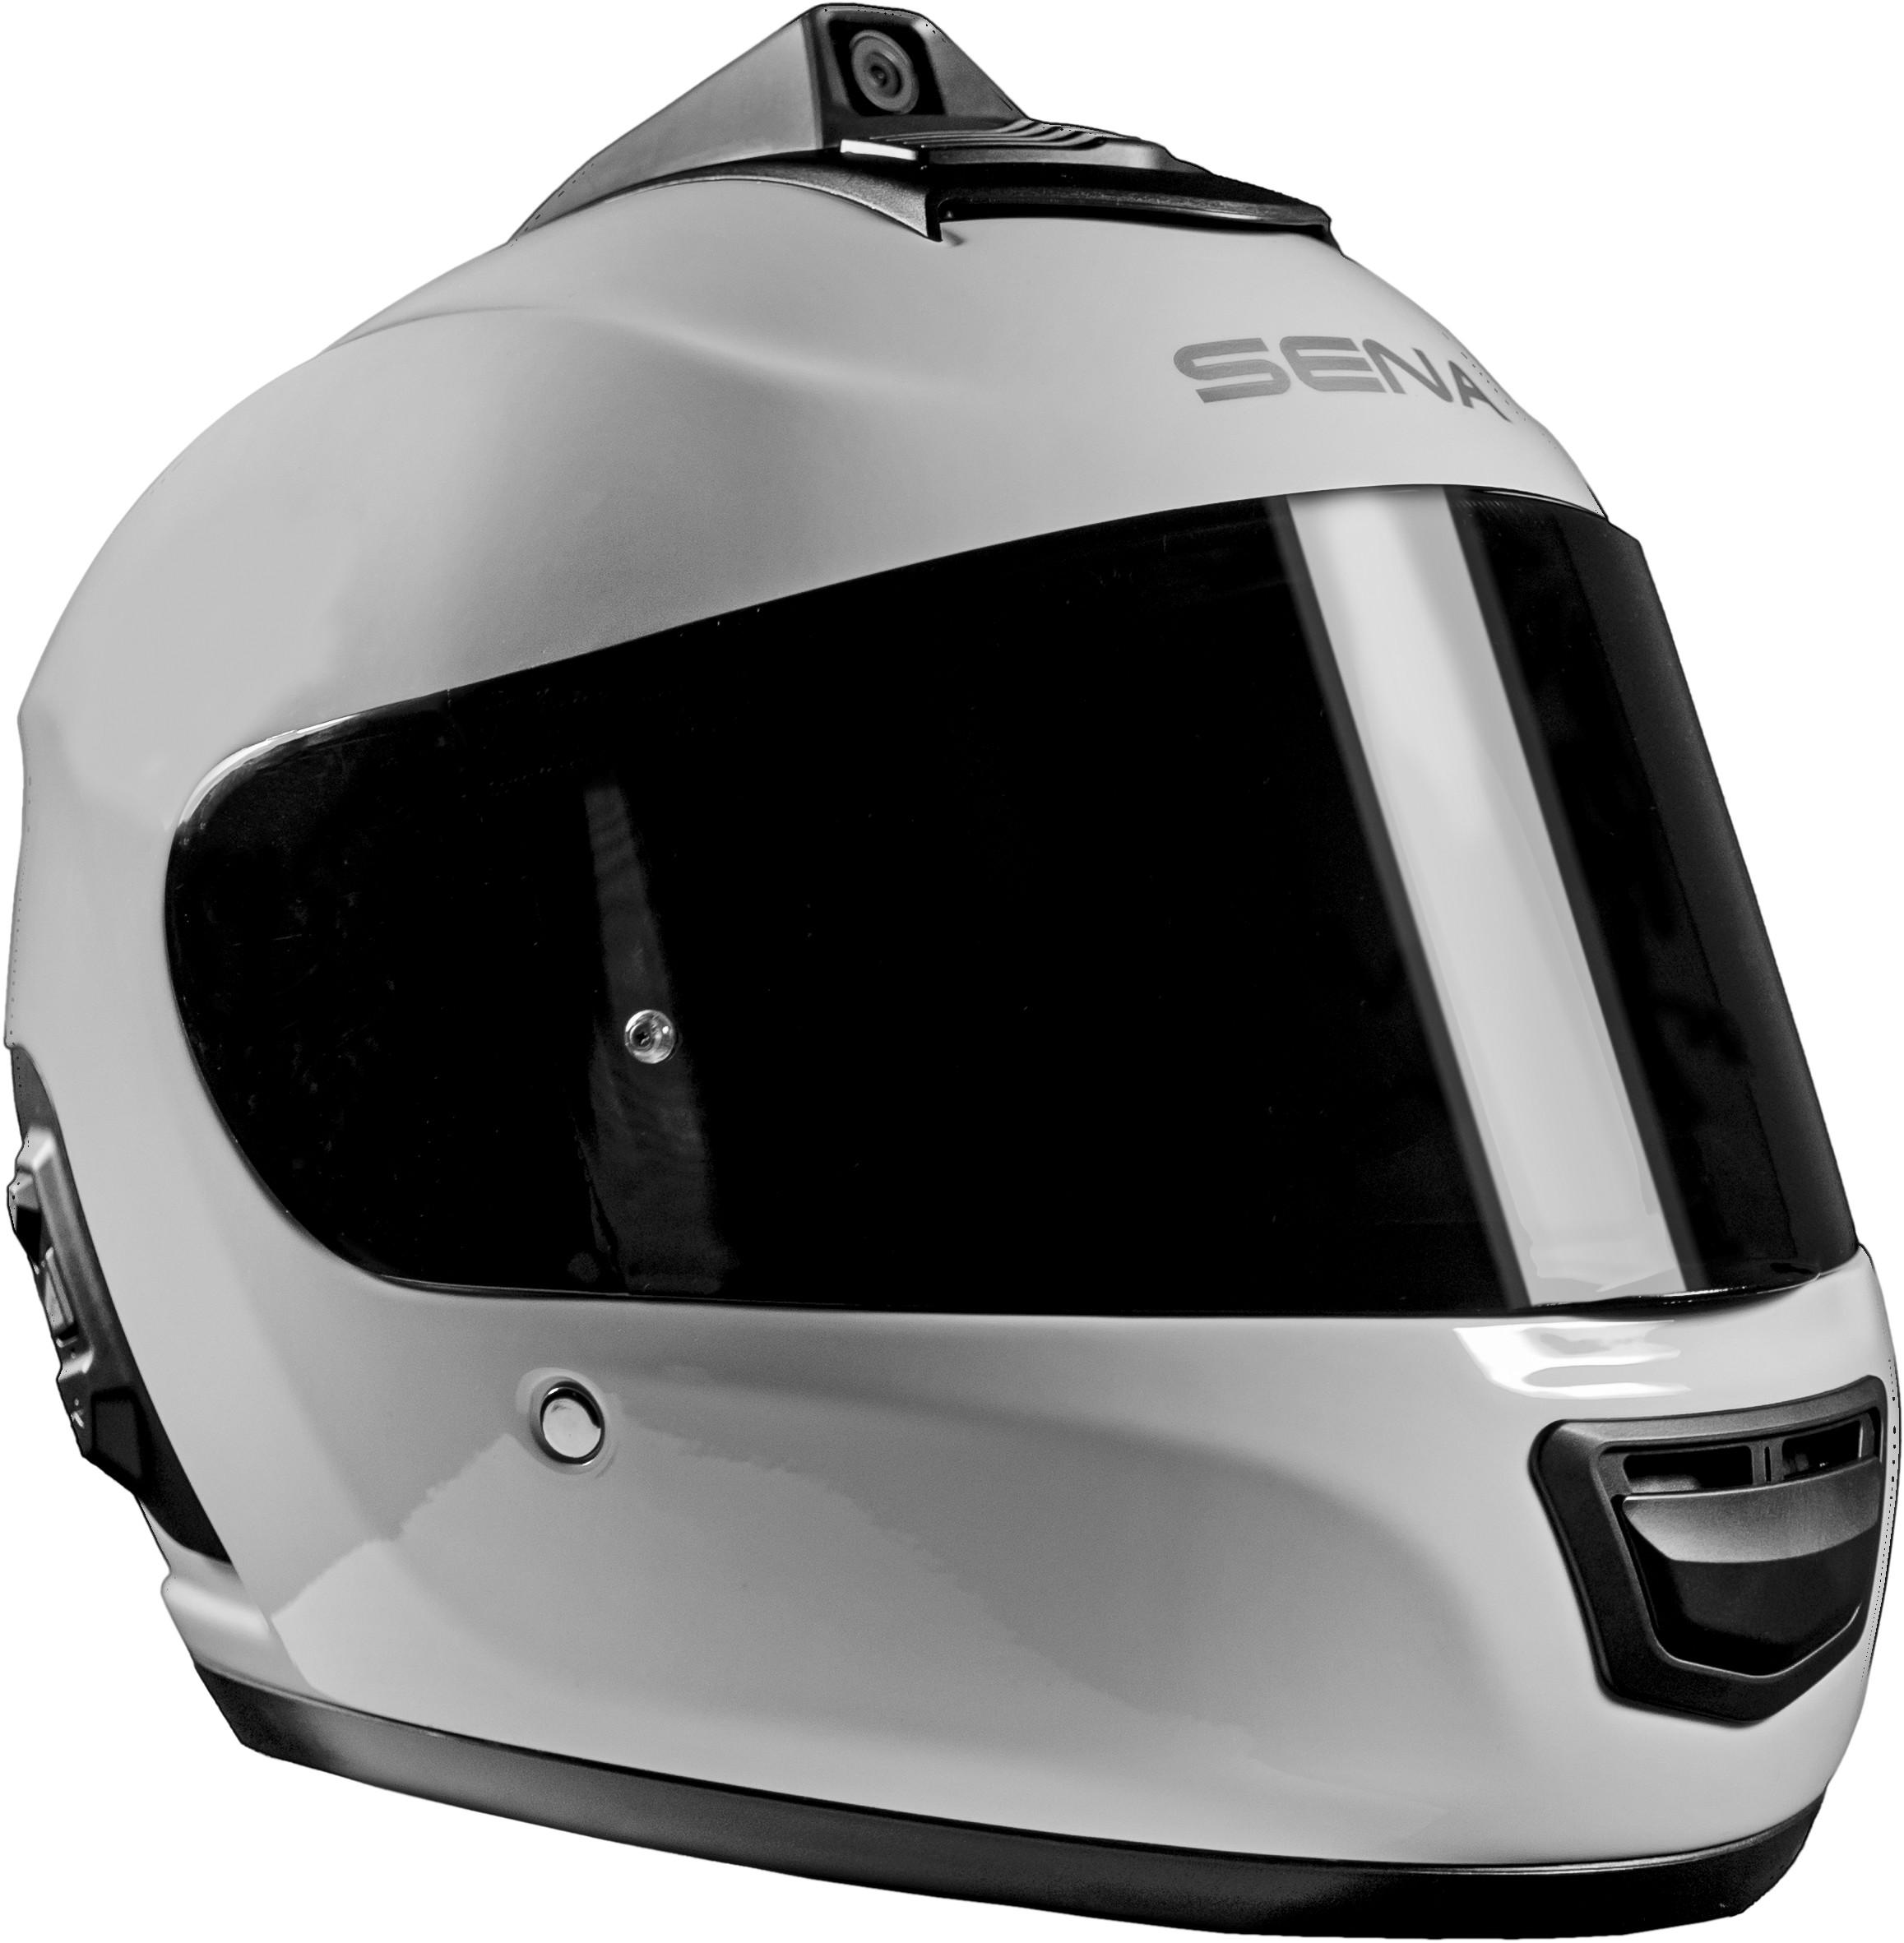 Sena Momentum Pro - Similar to Livemap Motorcycle Helmet